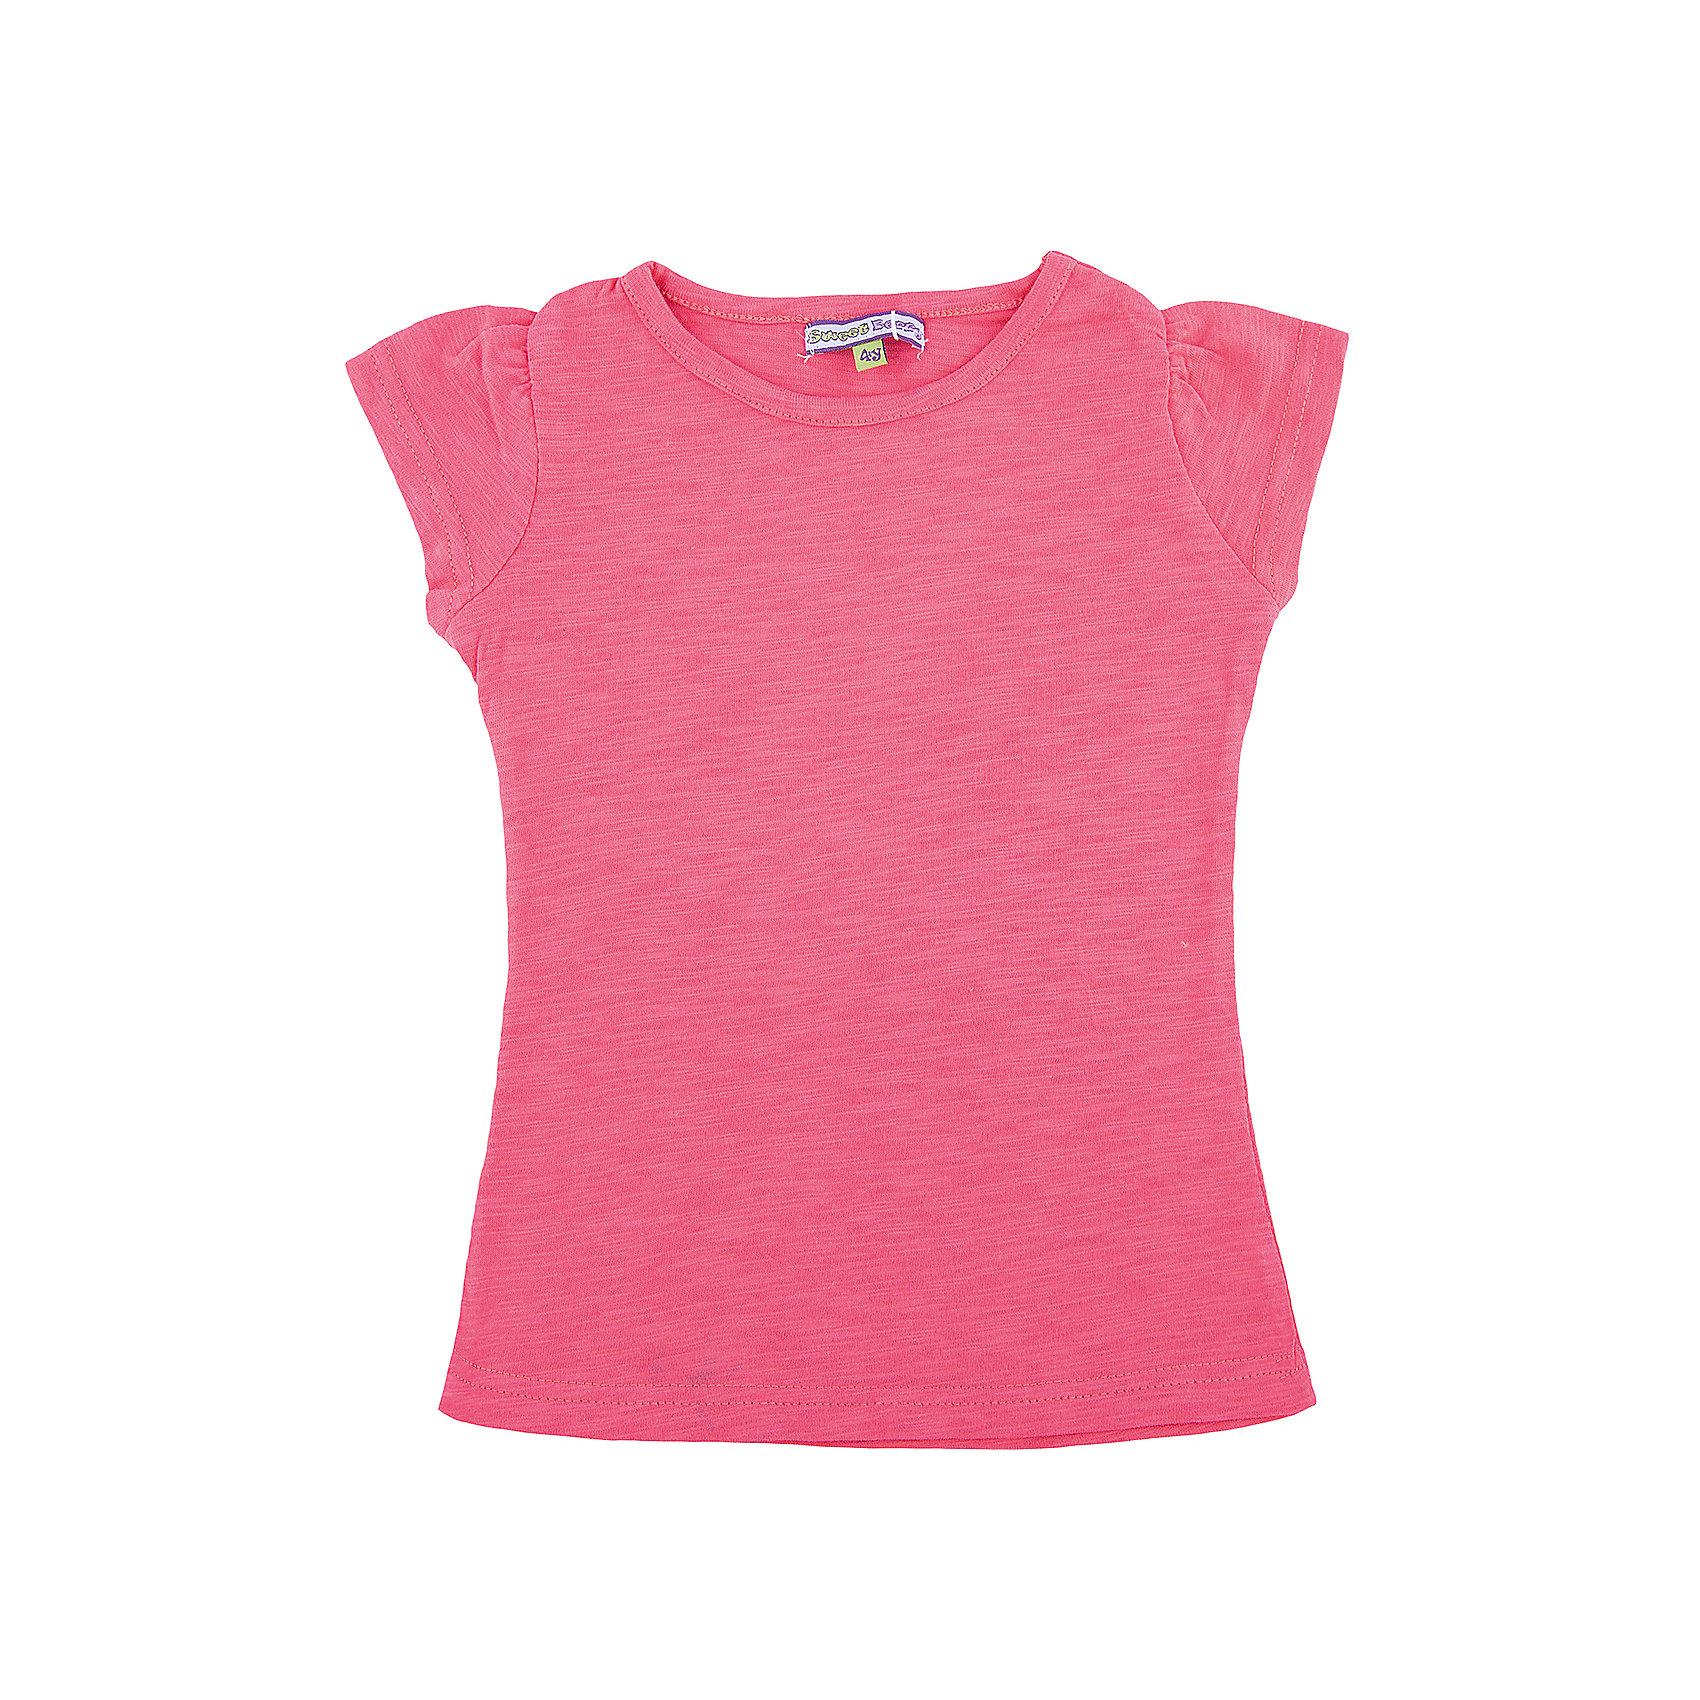 Футболка для девочки Sweet BerryБазовая футболка из эластичного трикотажа. Футболка приталенного силуэта.<br>Состав:<br>100% хлопок<br><br>Ширина мм: 199<br>Глубина мм: 10<br>Высота мм: 161<br>Вес г: 151<br>Цвет: розовый<br>Возраст от месяцев: 48<br>Возраст до месяцев: 60<br>Пол: Женский<br>Возраст: Детский<br>Размер: 110,122,98,104,128,116<br>SKU: 4521474